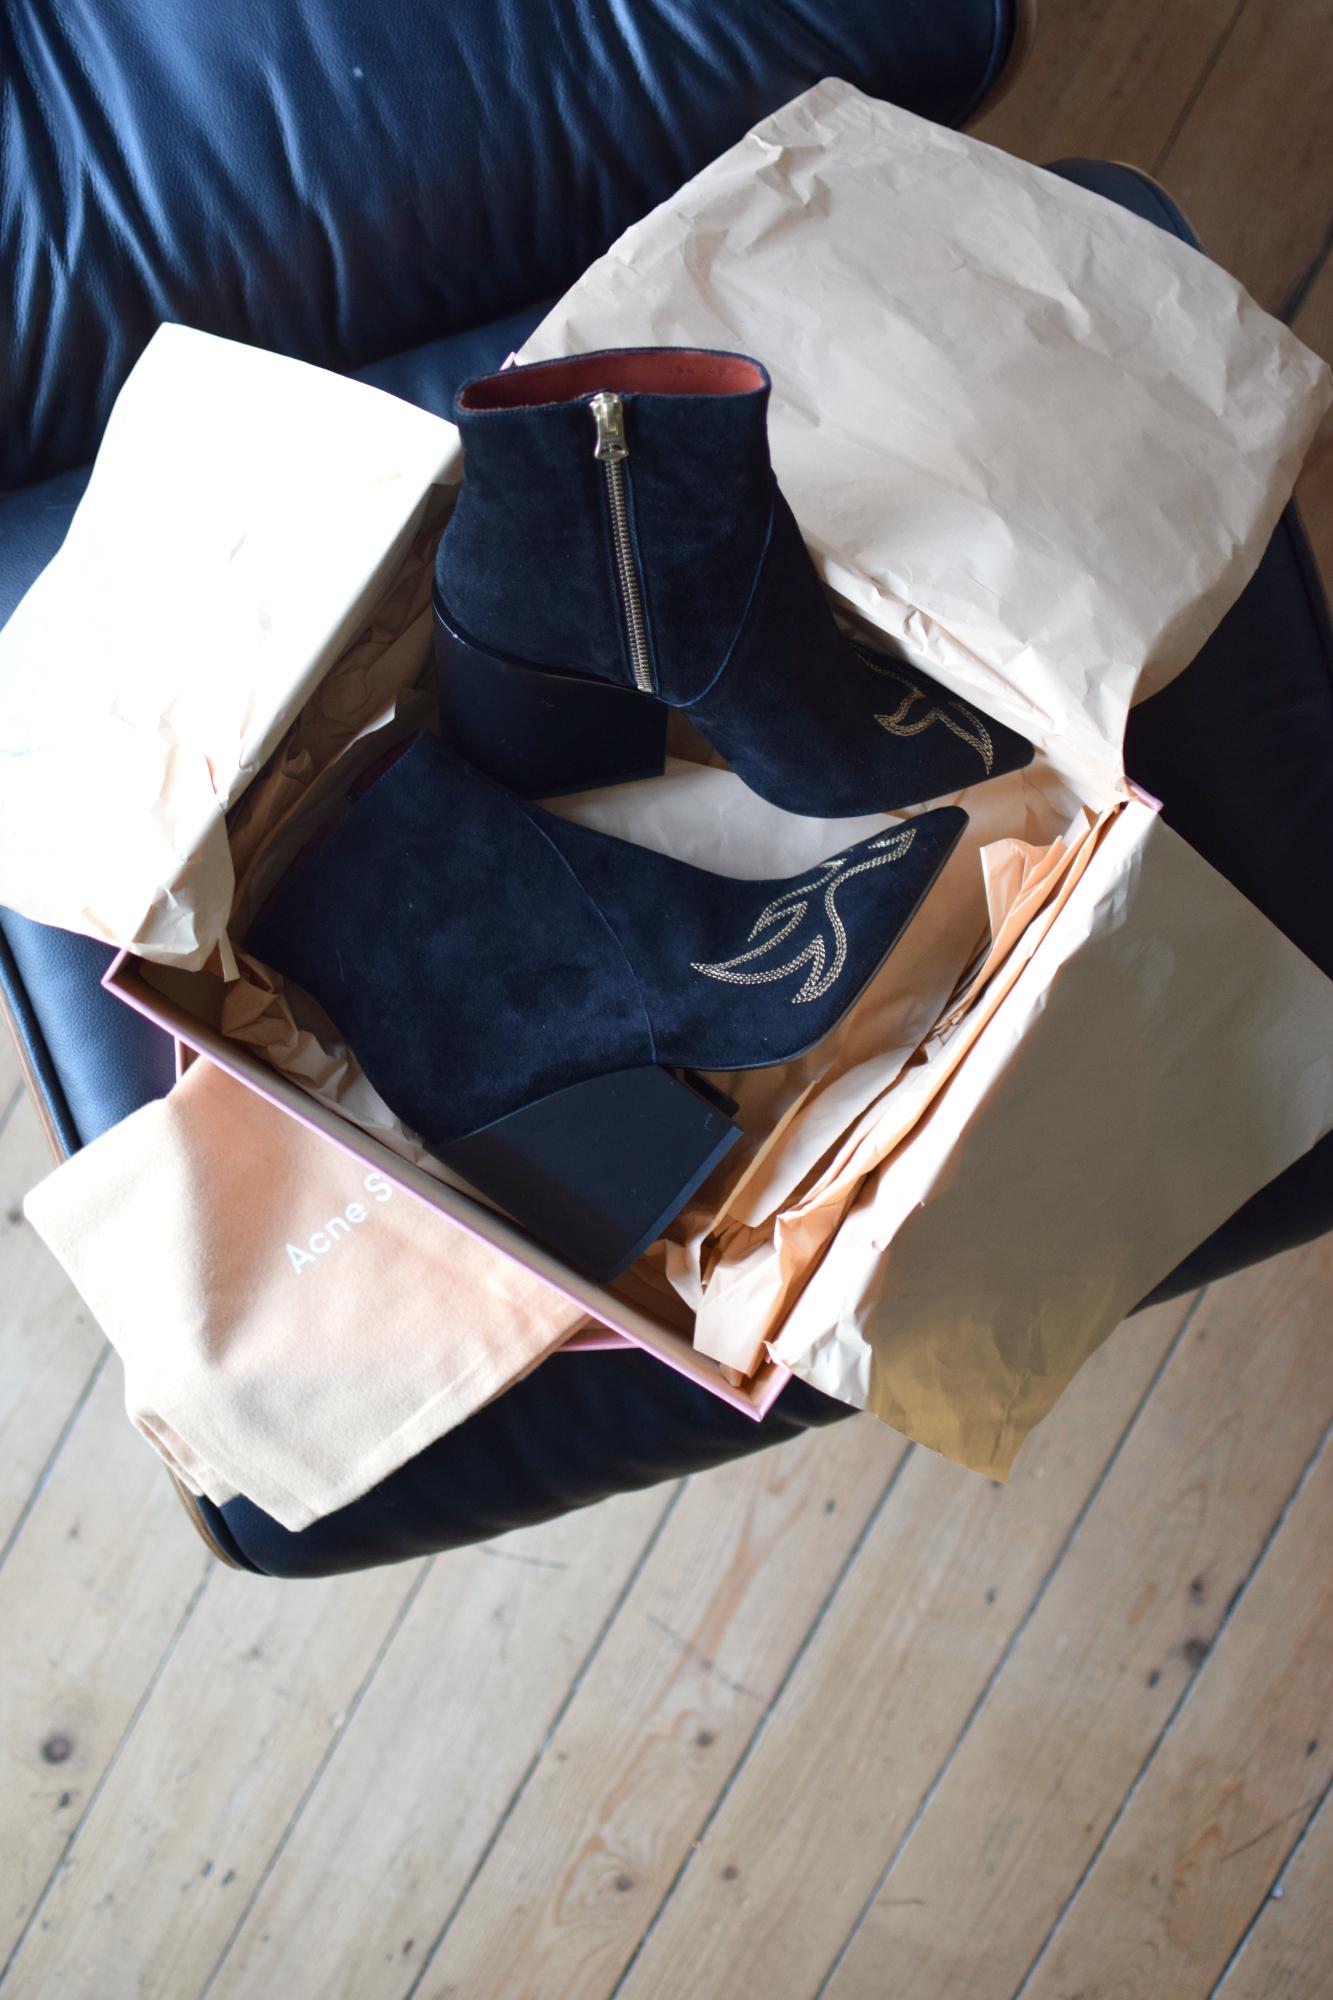 shoes 5.JPG